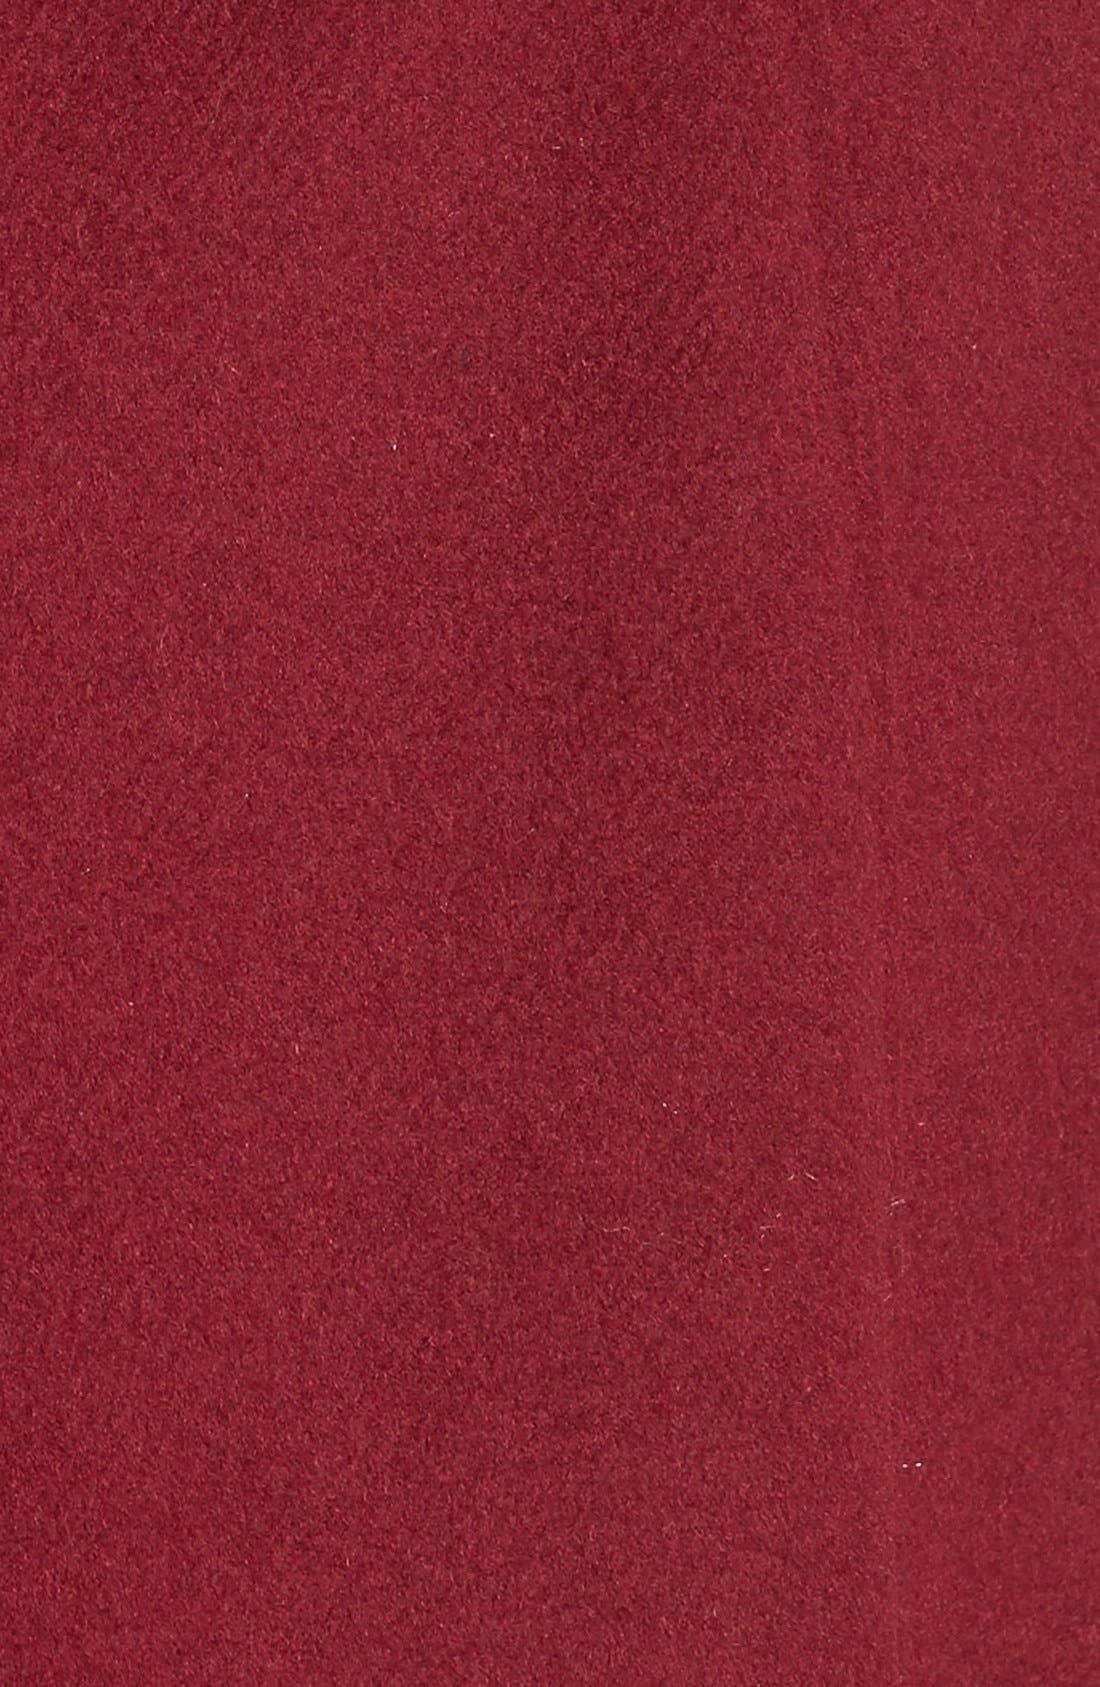 Wool Blend Long Military Coat,                             Alternate thumbnail 25, color,